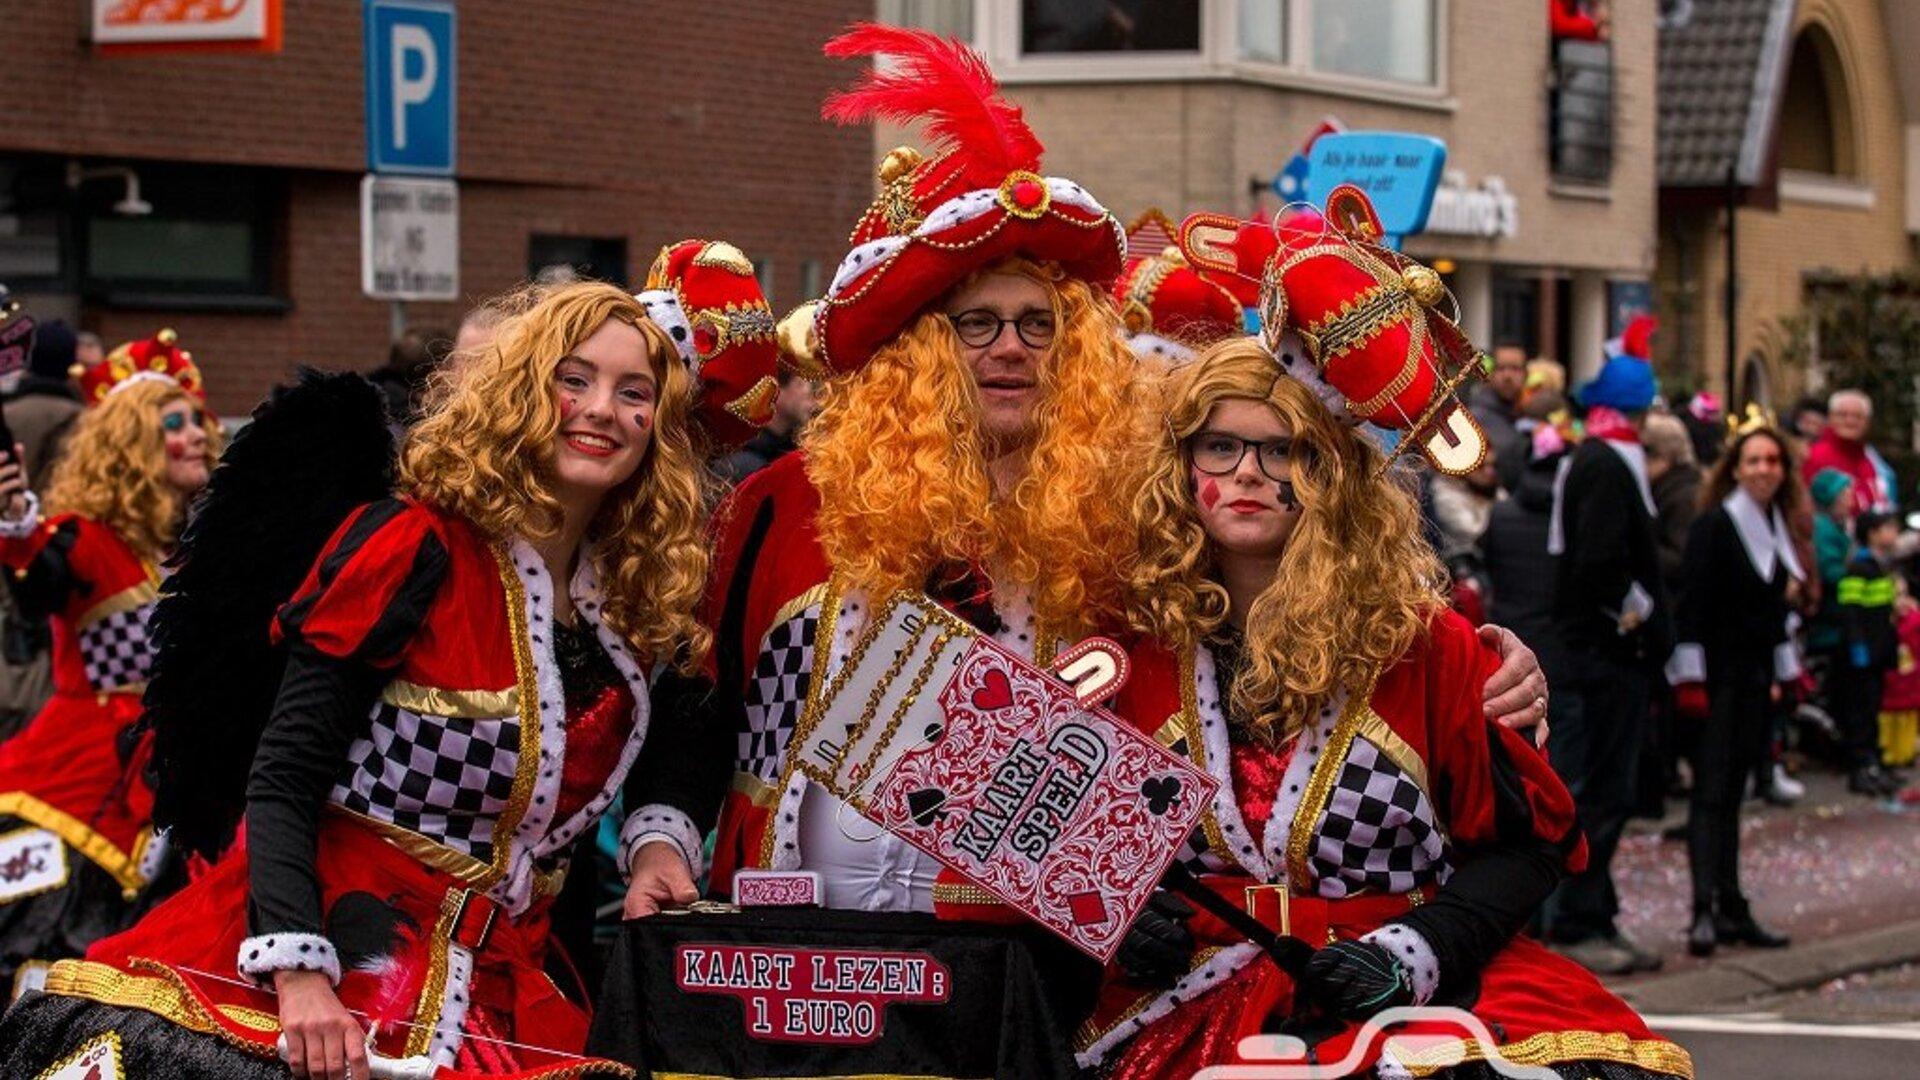 carnaval-25-2-2017-foto-alex-de-zwart-img-9309.jpg